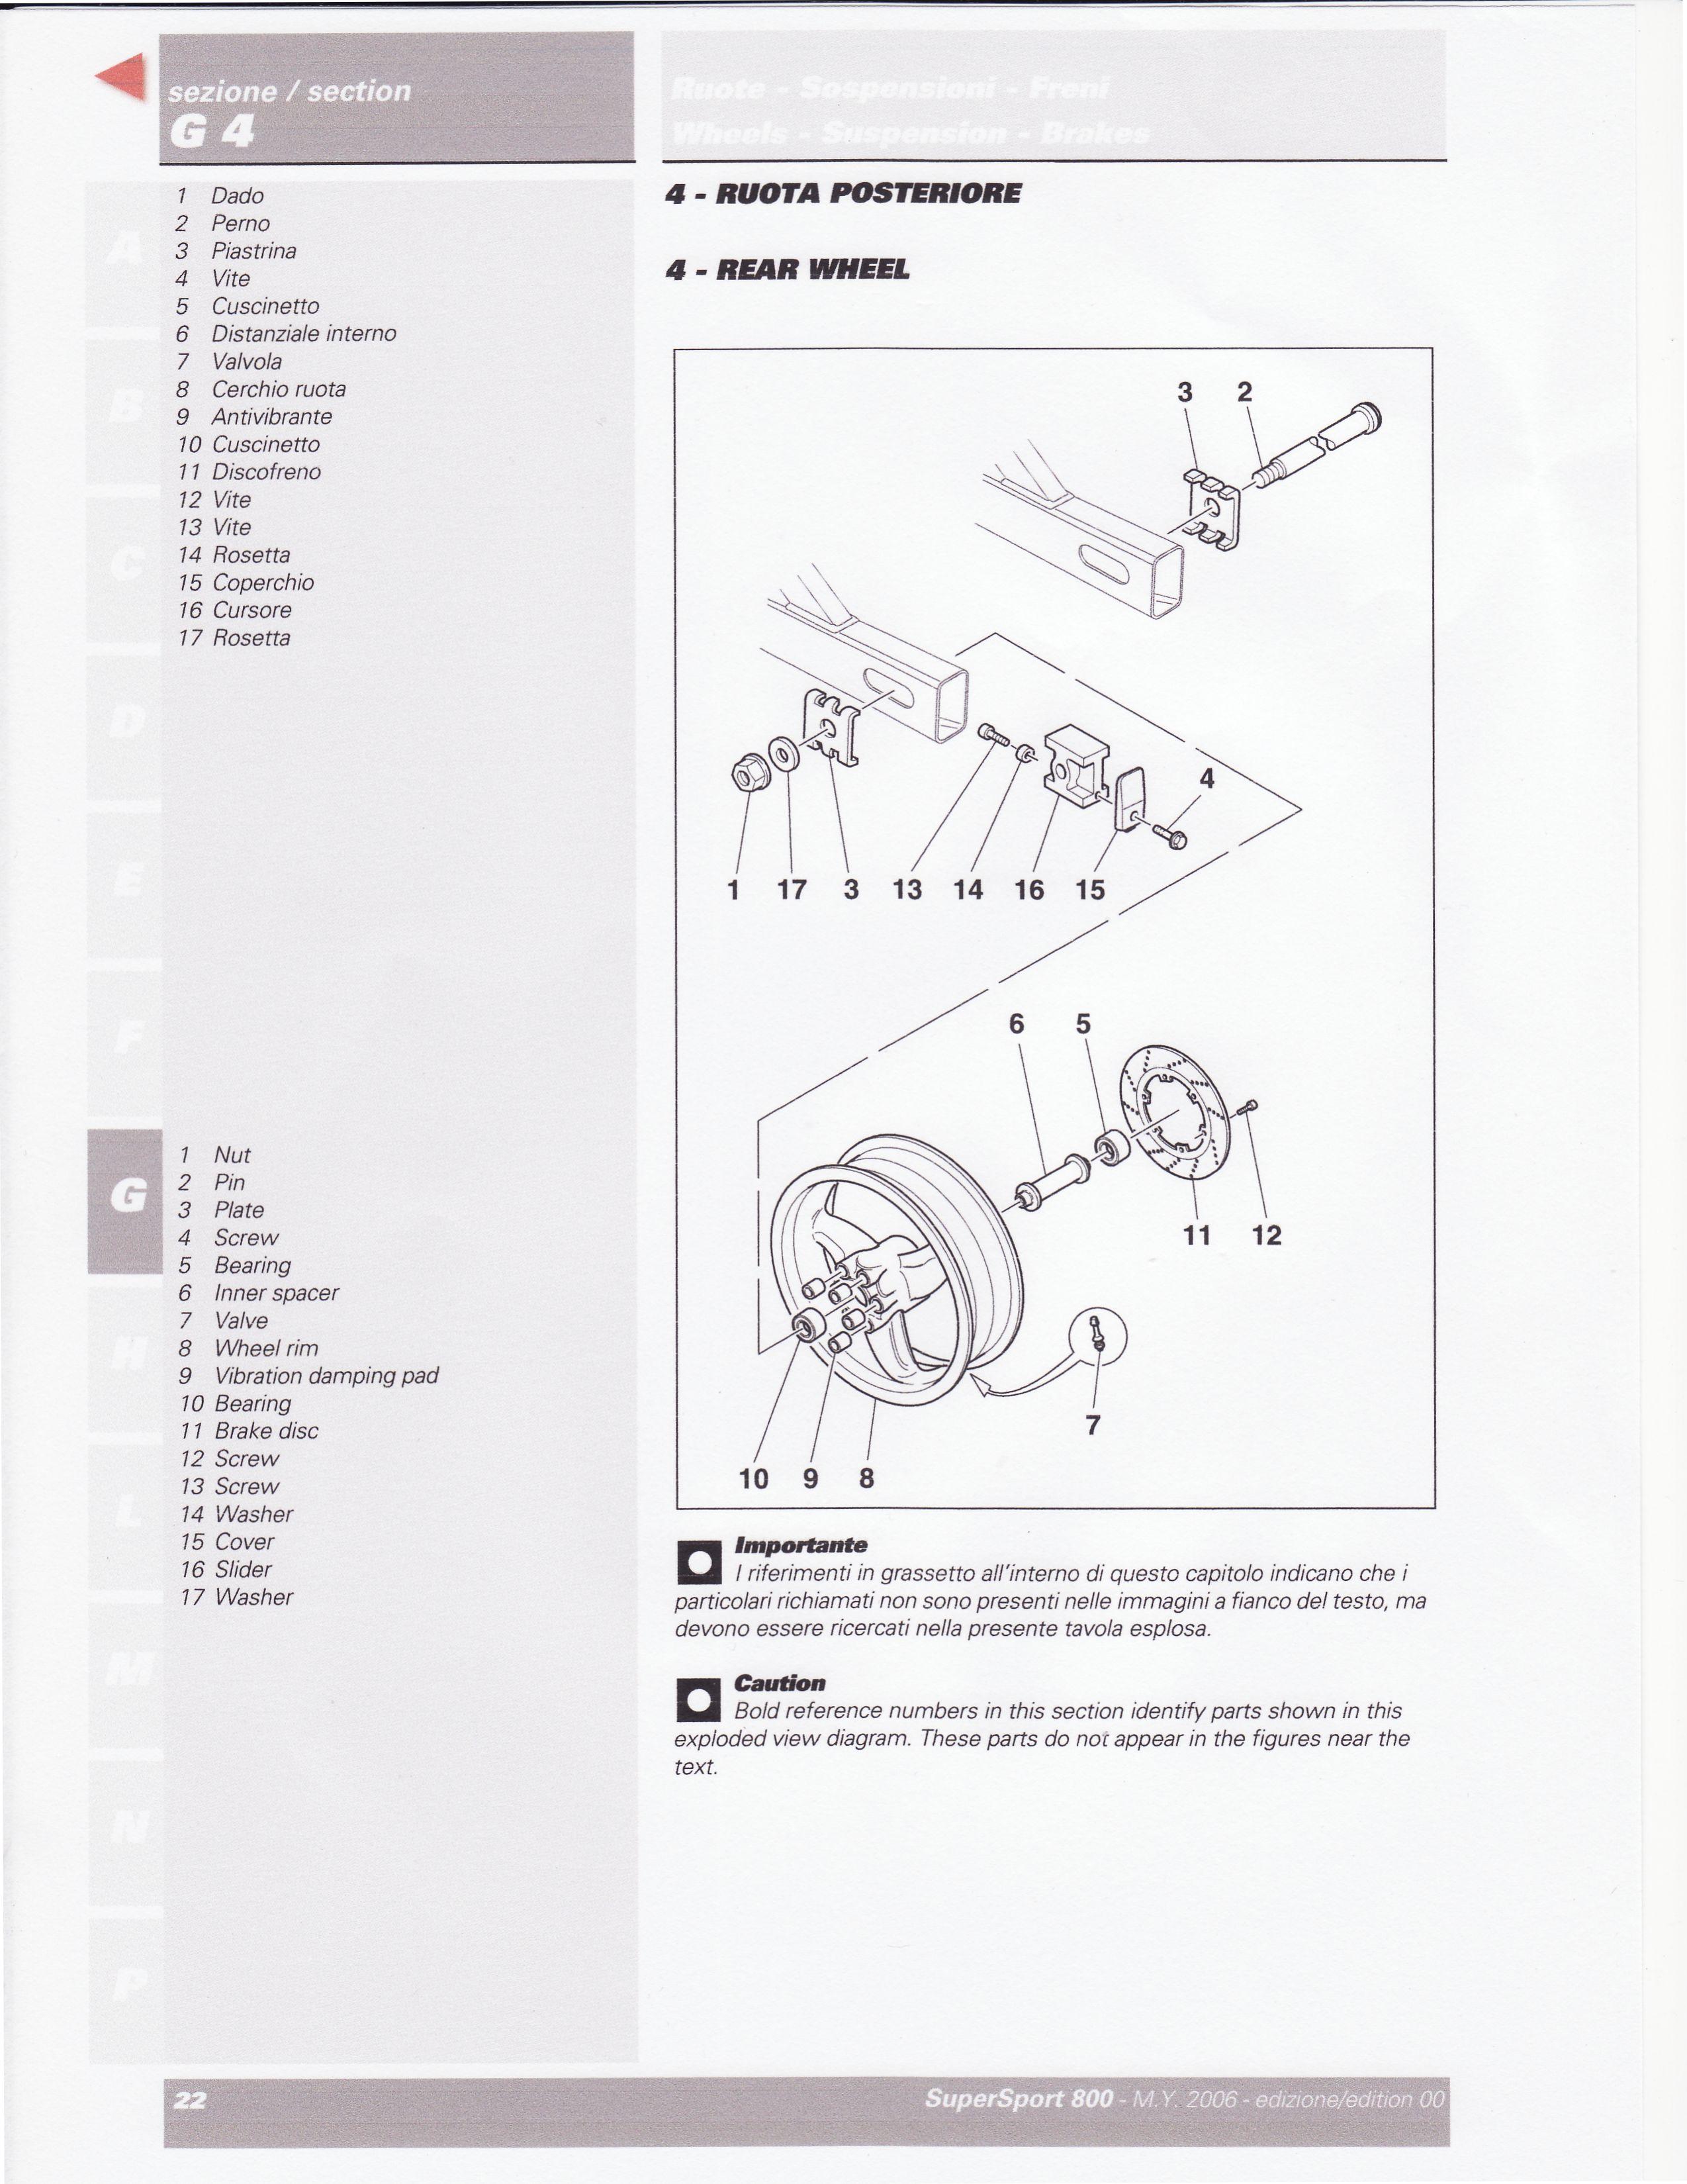 refitting ducati 800ss rear wheel ducati ms the ultimate ducati rh ducati ms 2015 Ducati 1098 04 Ducati 800SS